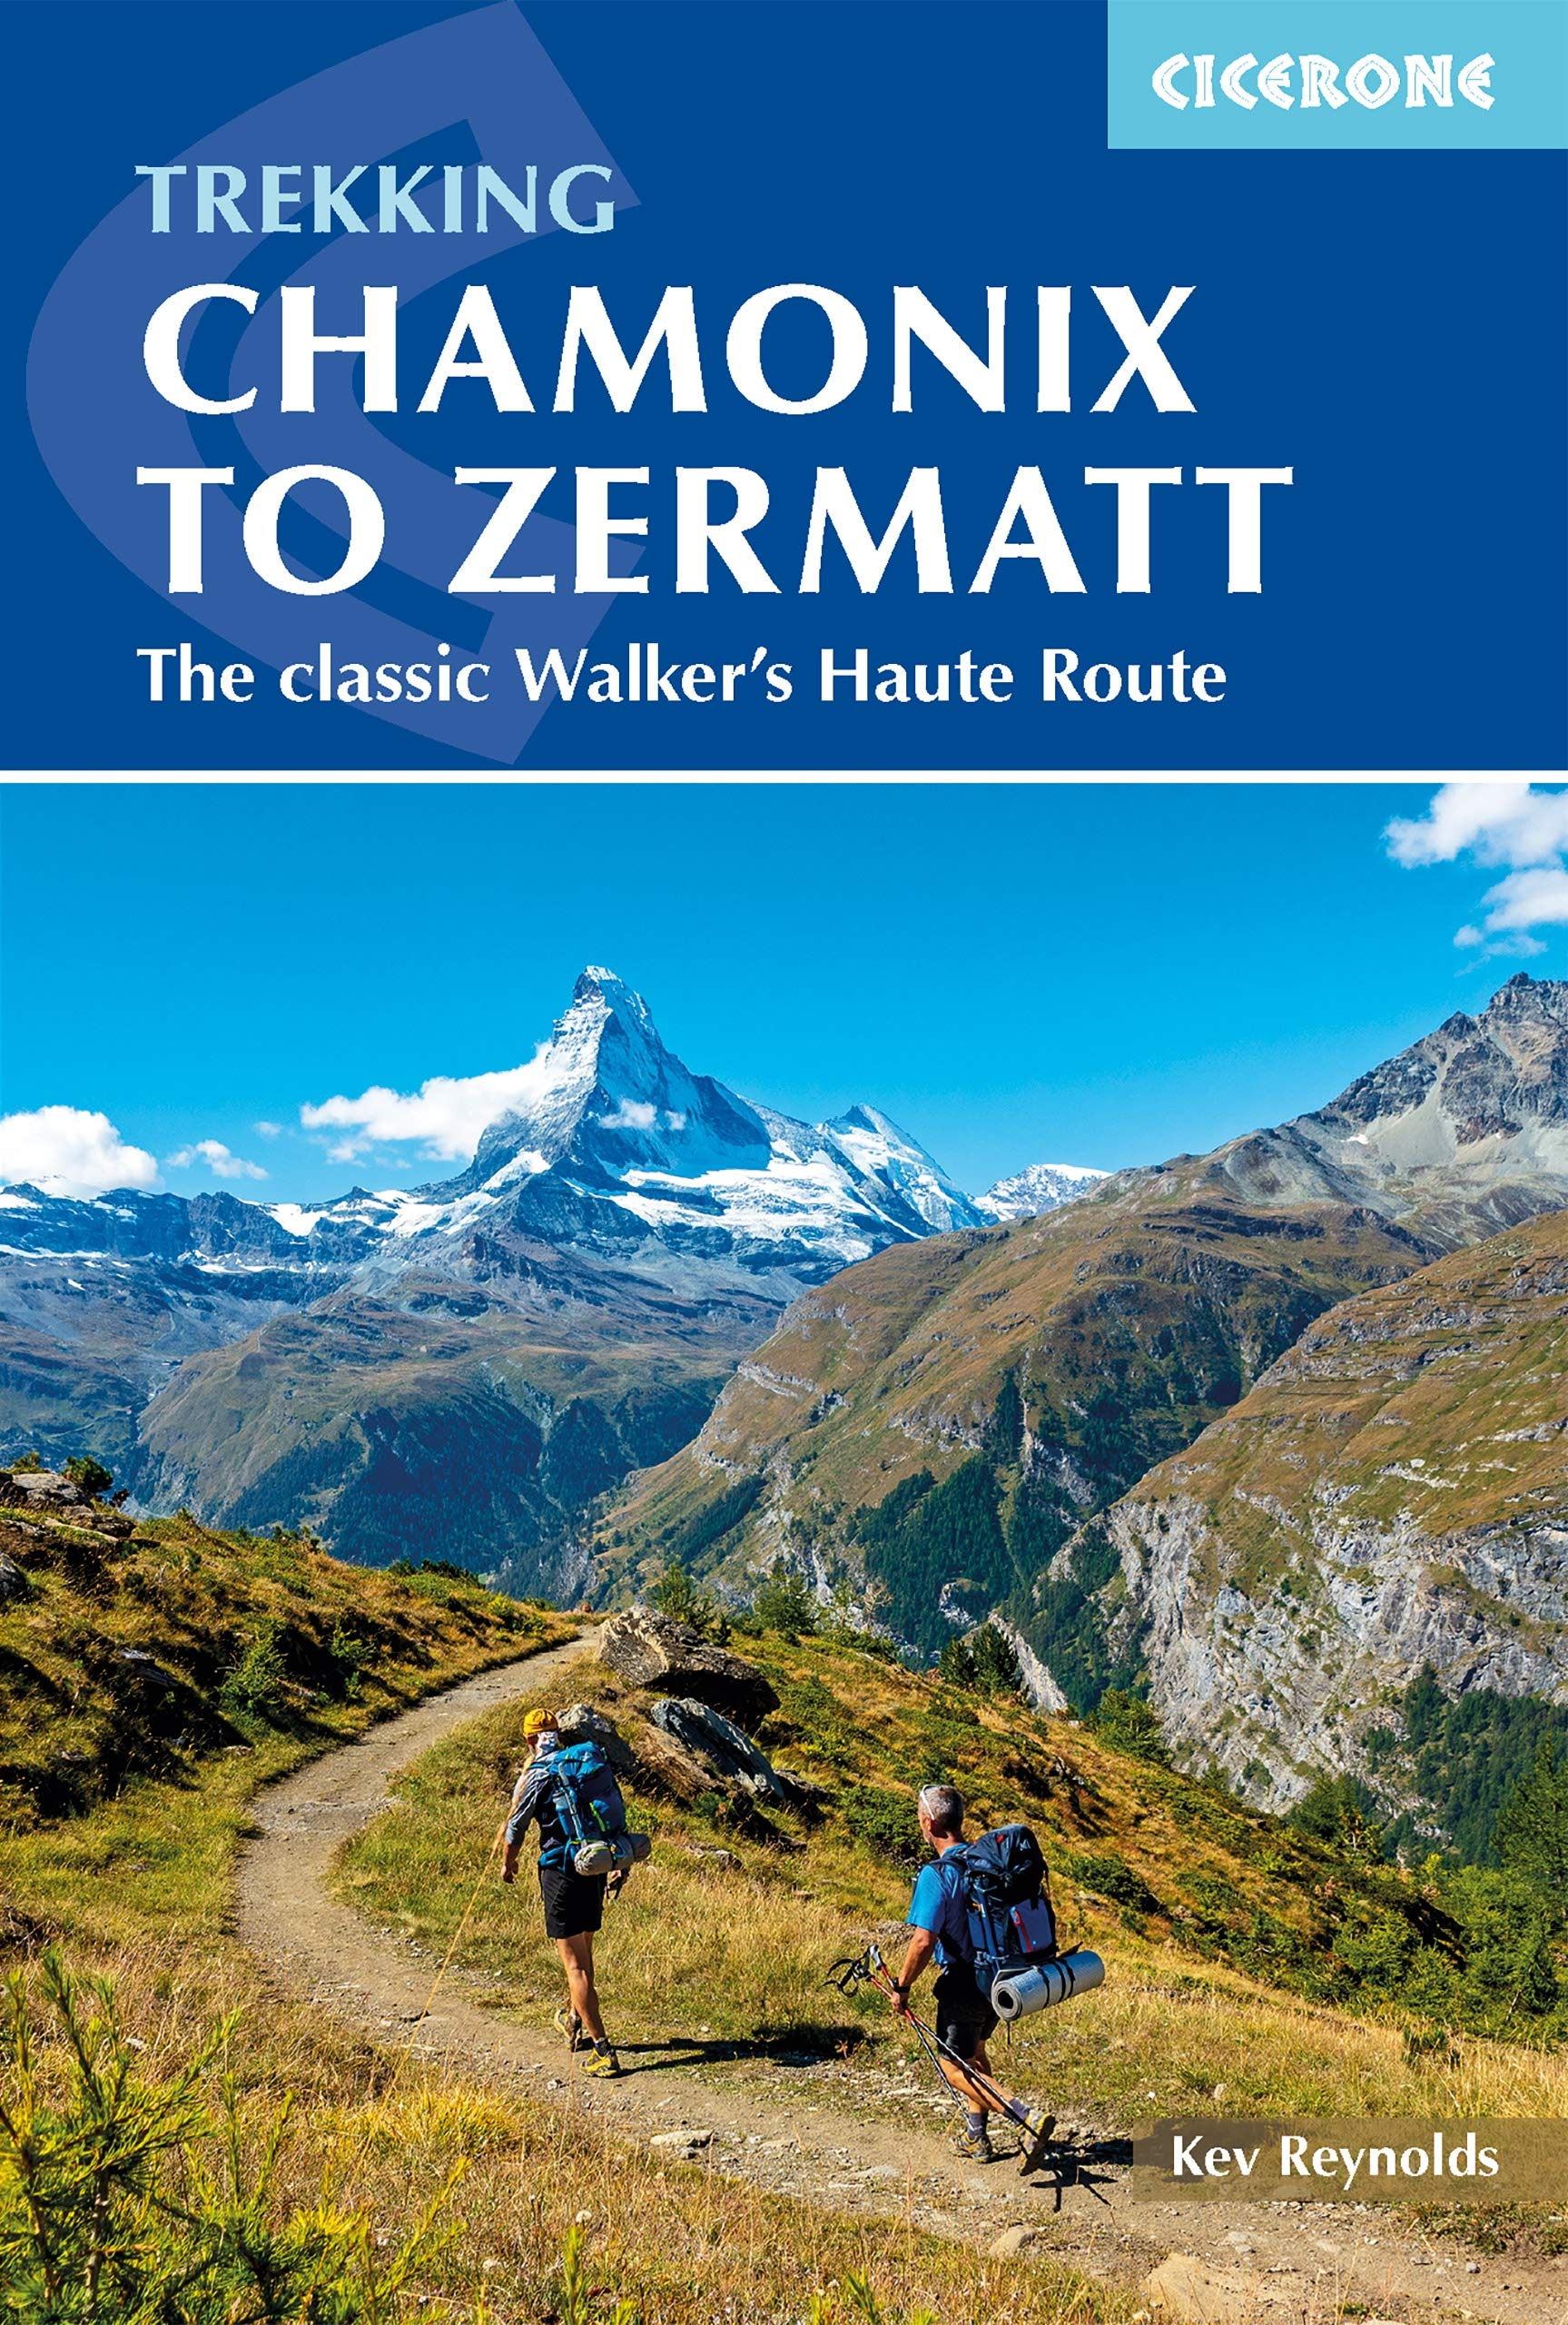 Chamonix To Zermatt  The Classic Walker's Haute Route  Cicerone Trekking Guides   English Edition